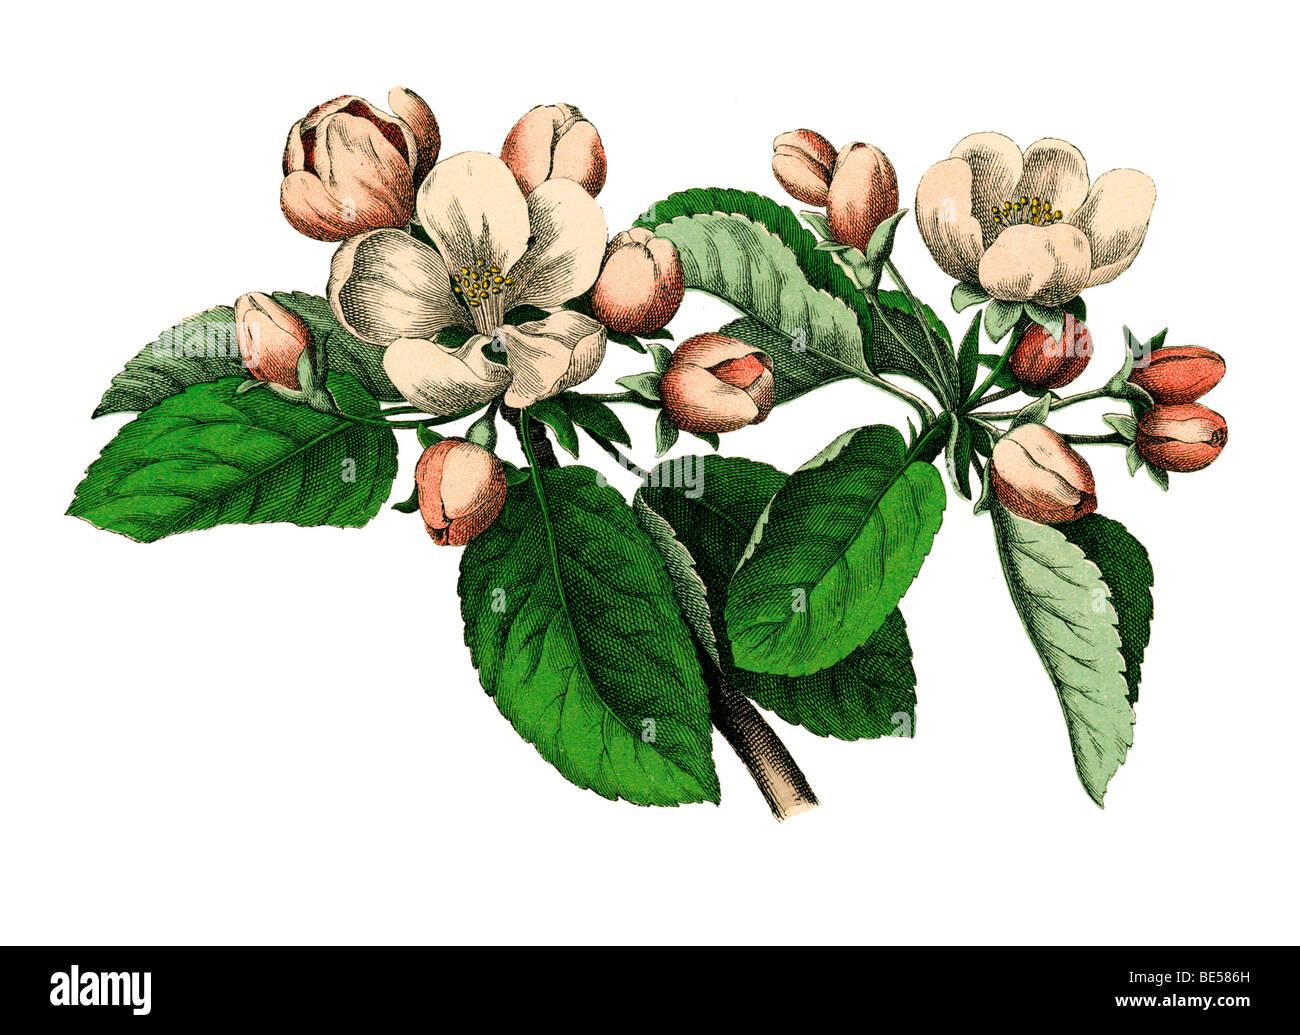 Apple blossoms, historical illustration from: Moritz Willkomm: Naturgeschichte des Pflanzenreichs, Natural history - Stock Image